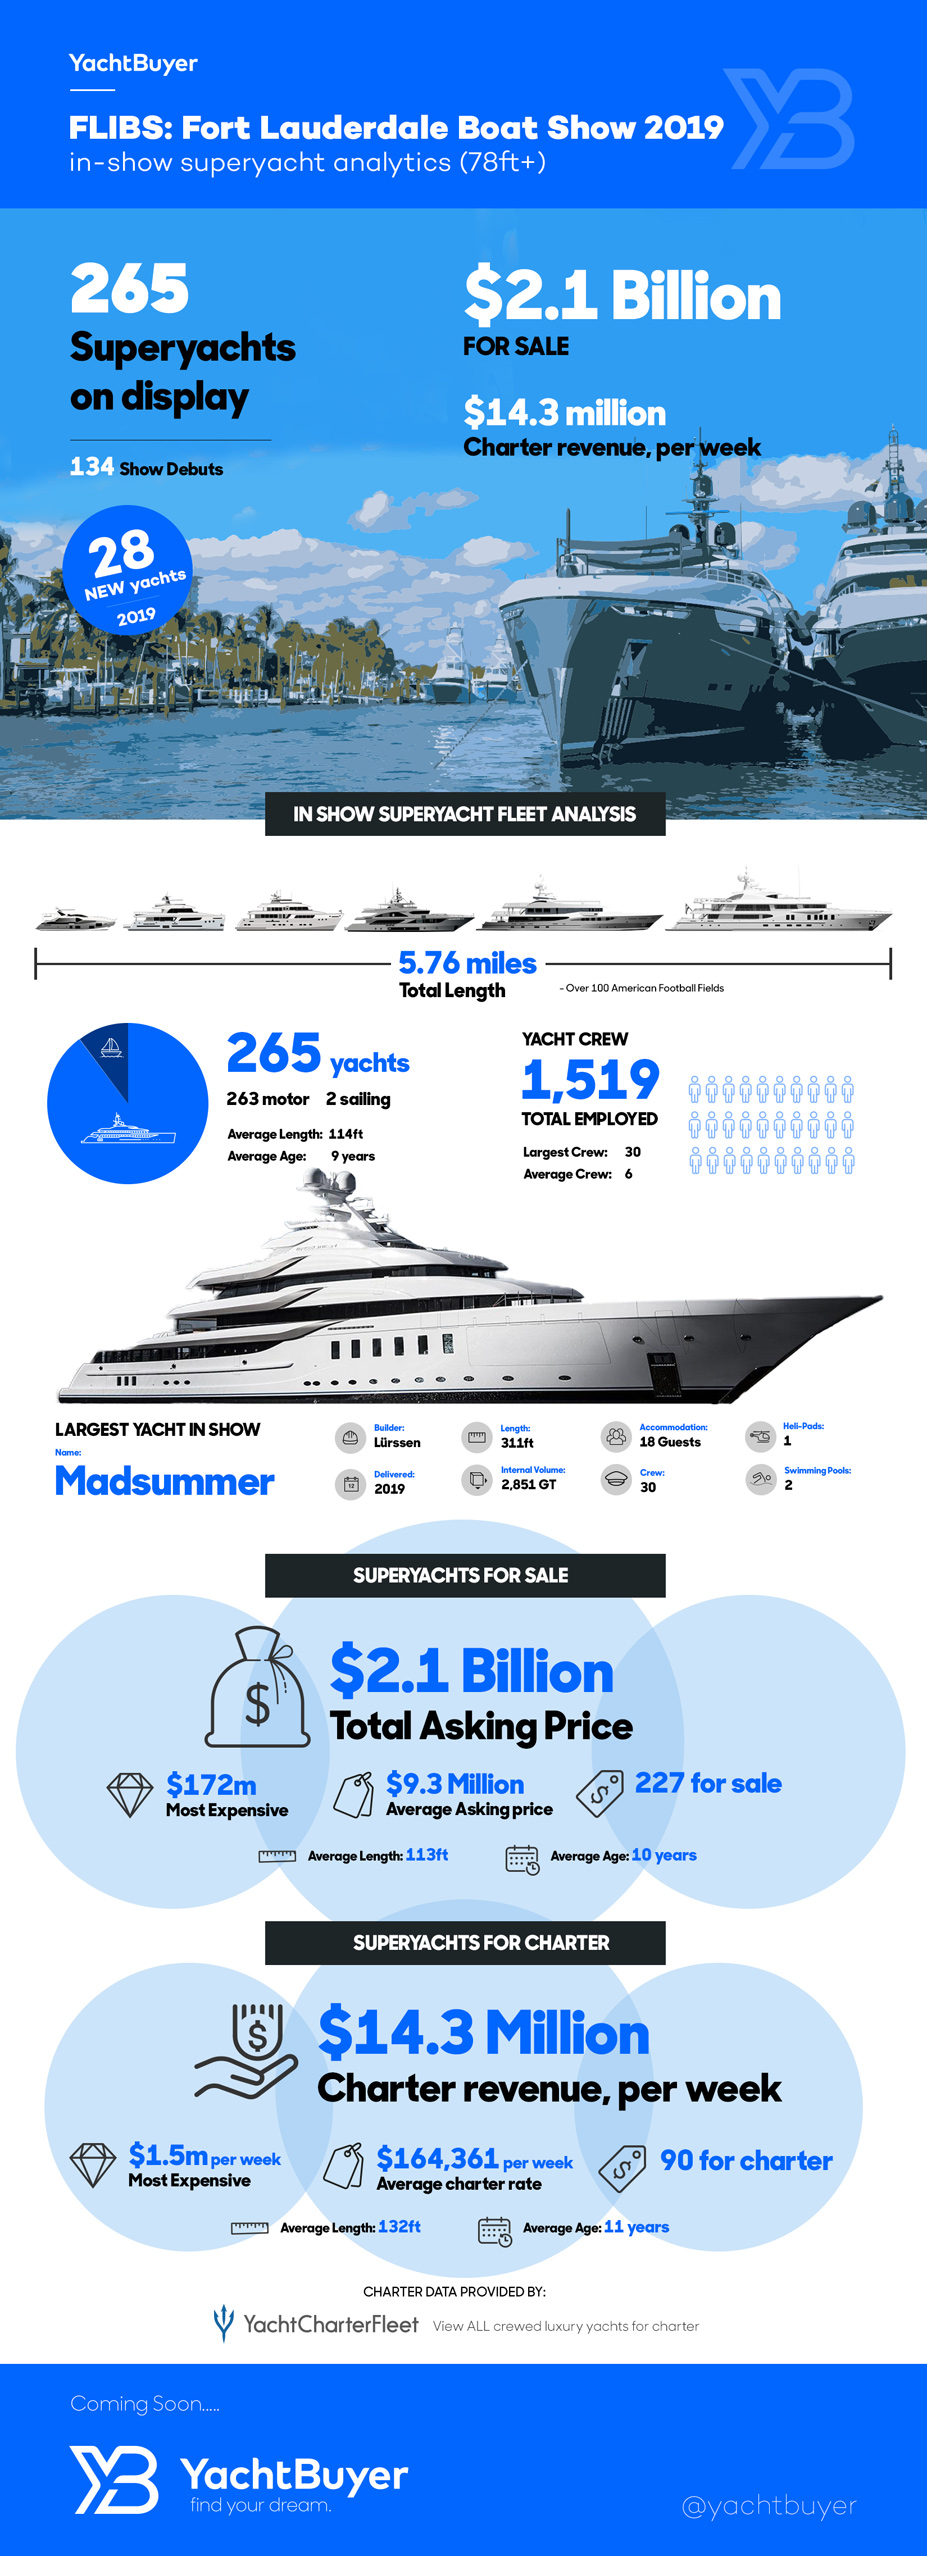 Fort Lauderdale International Boat Show 2019 Fleet Facts